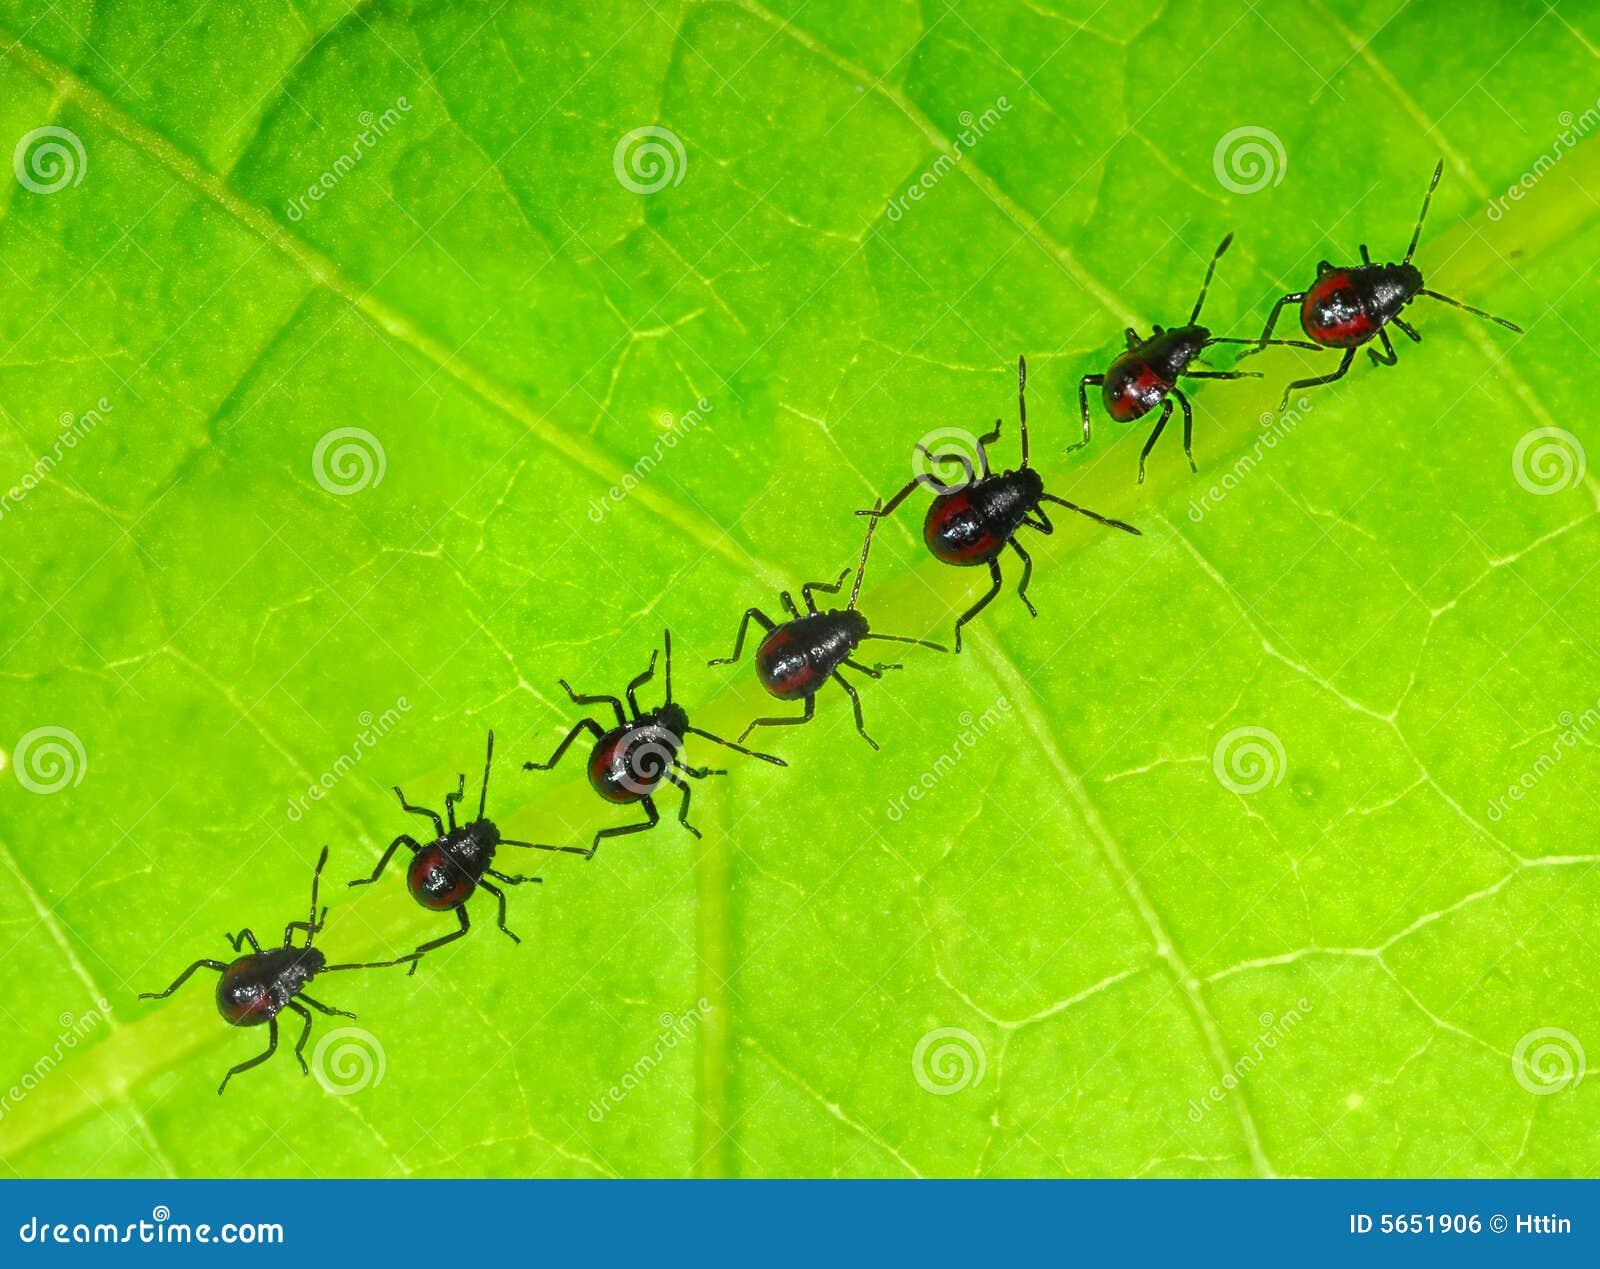 Newly born bugs